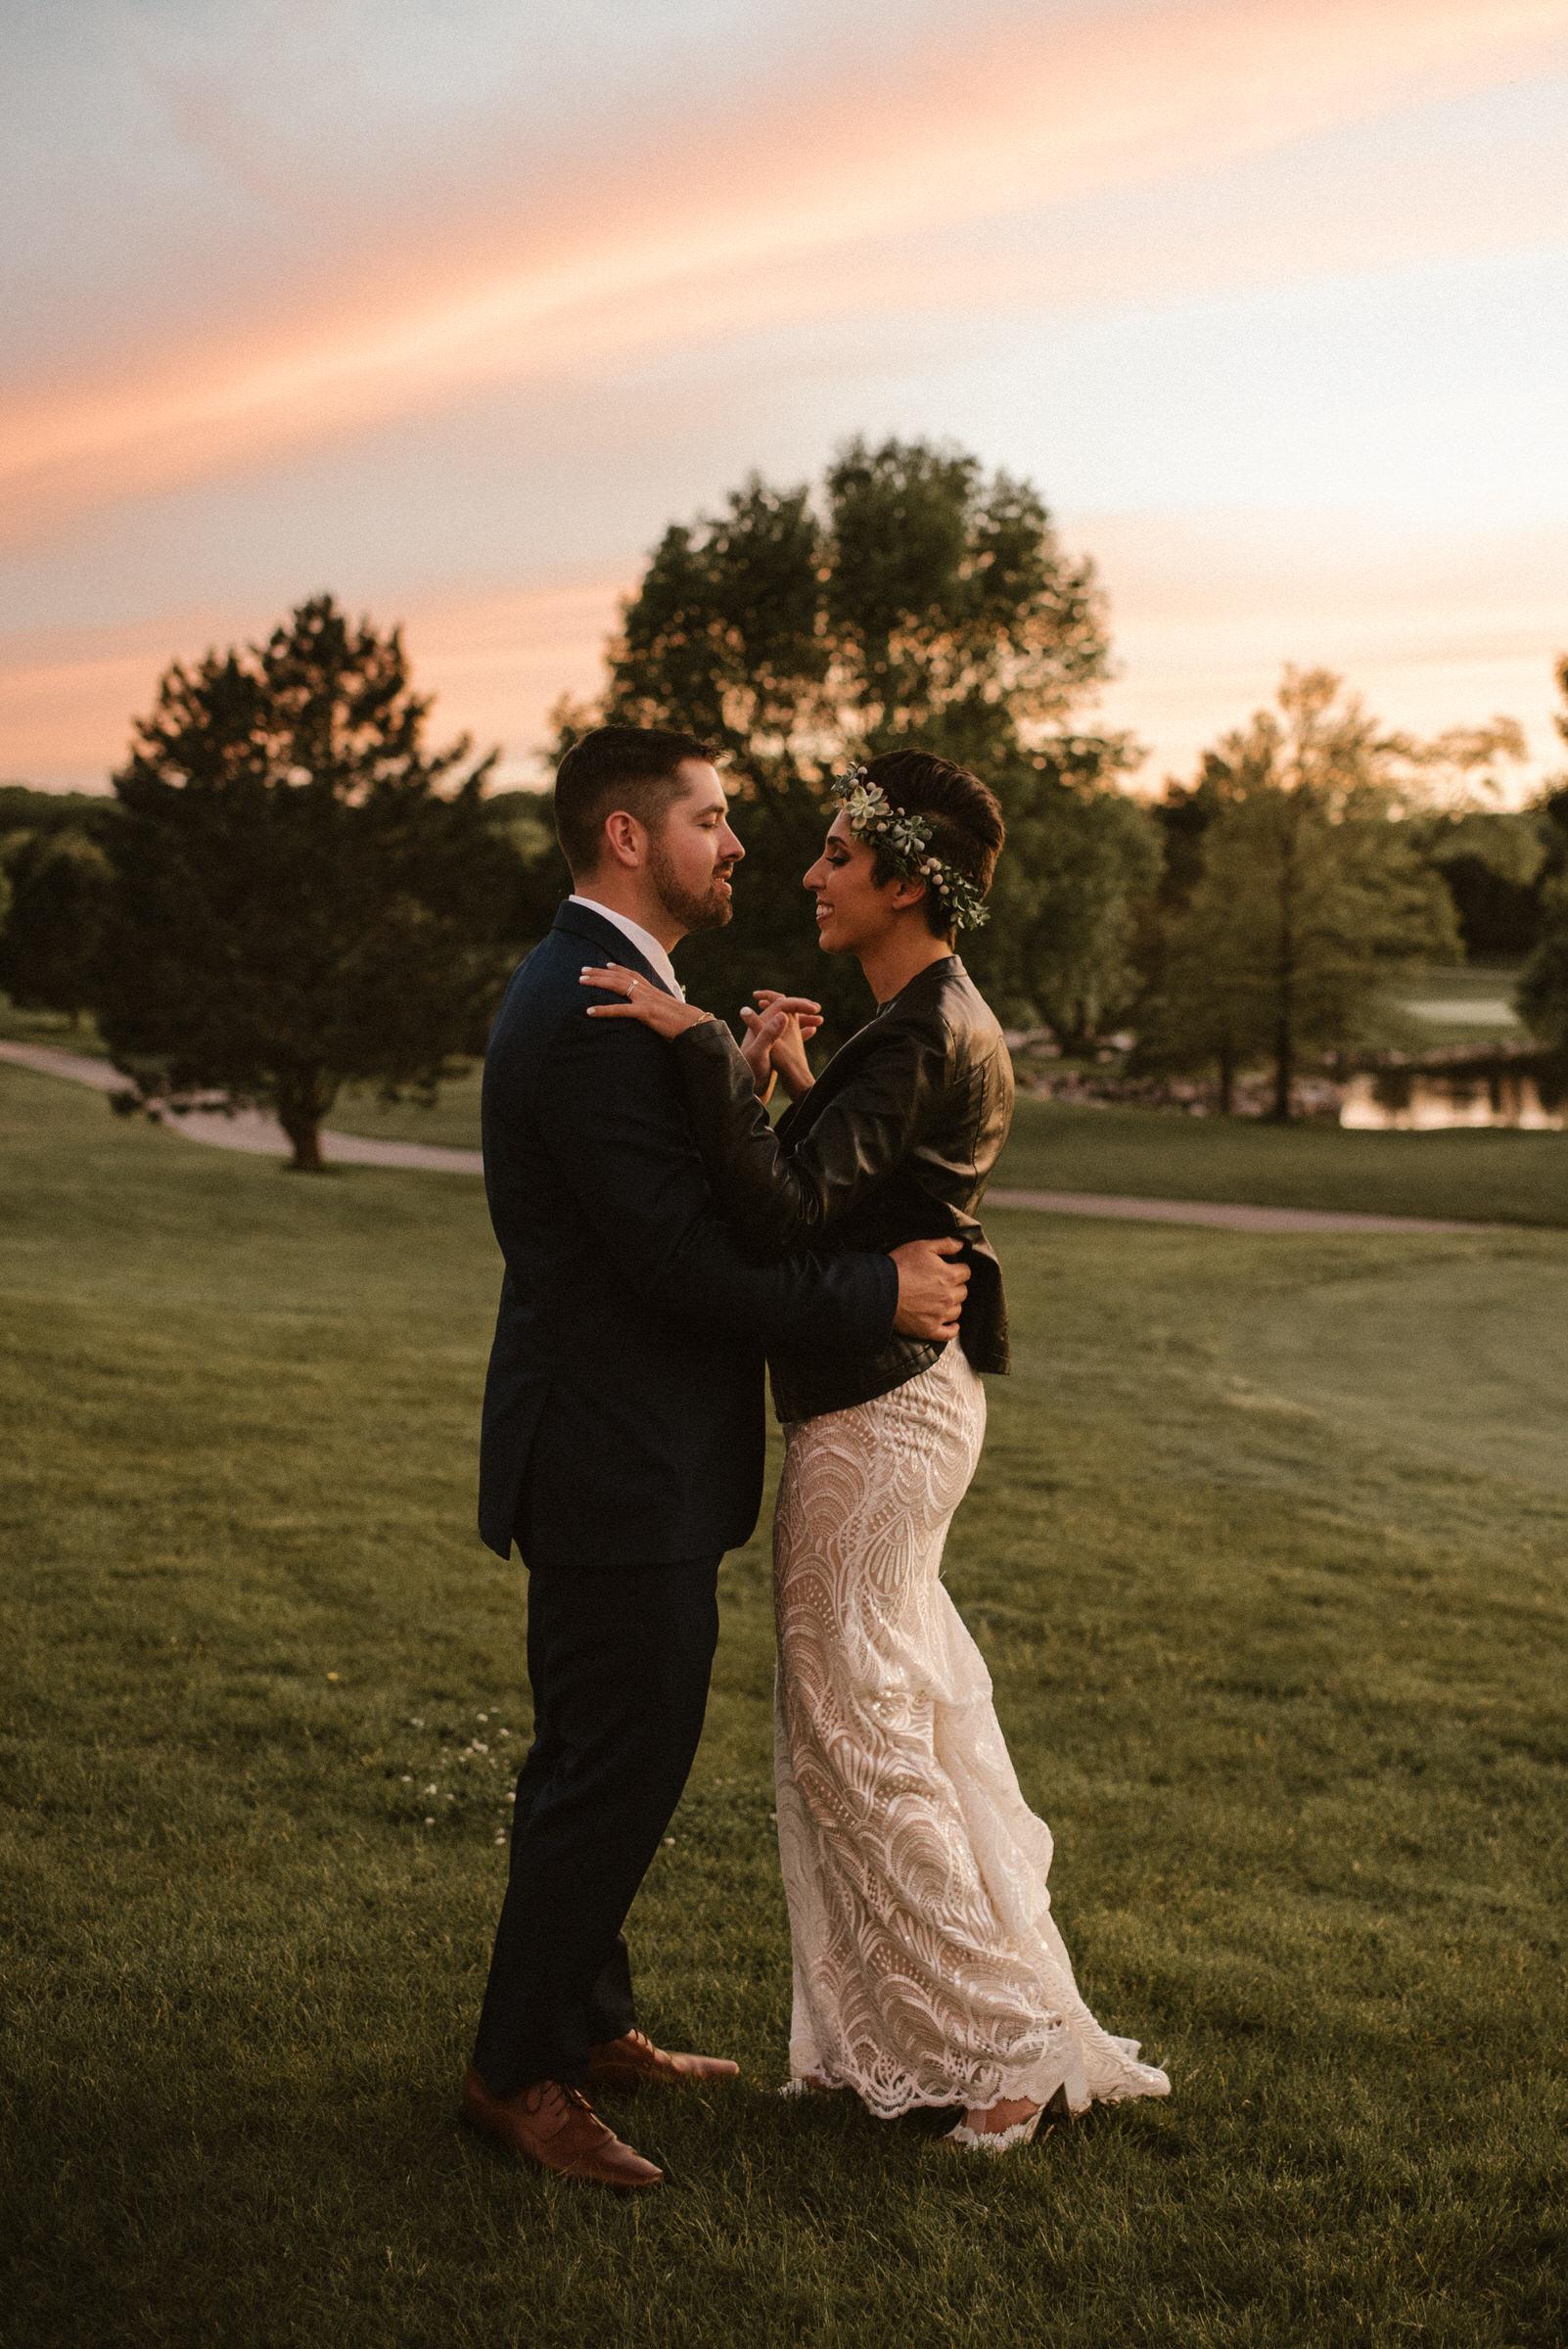 Wilderness-Ridge-Lincoln-Nebraska-Wedding-Kaylie-Sirek-Photography-125.jpg